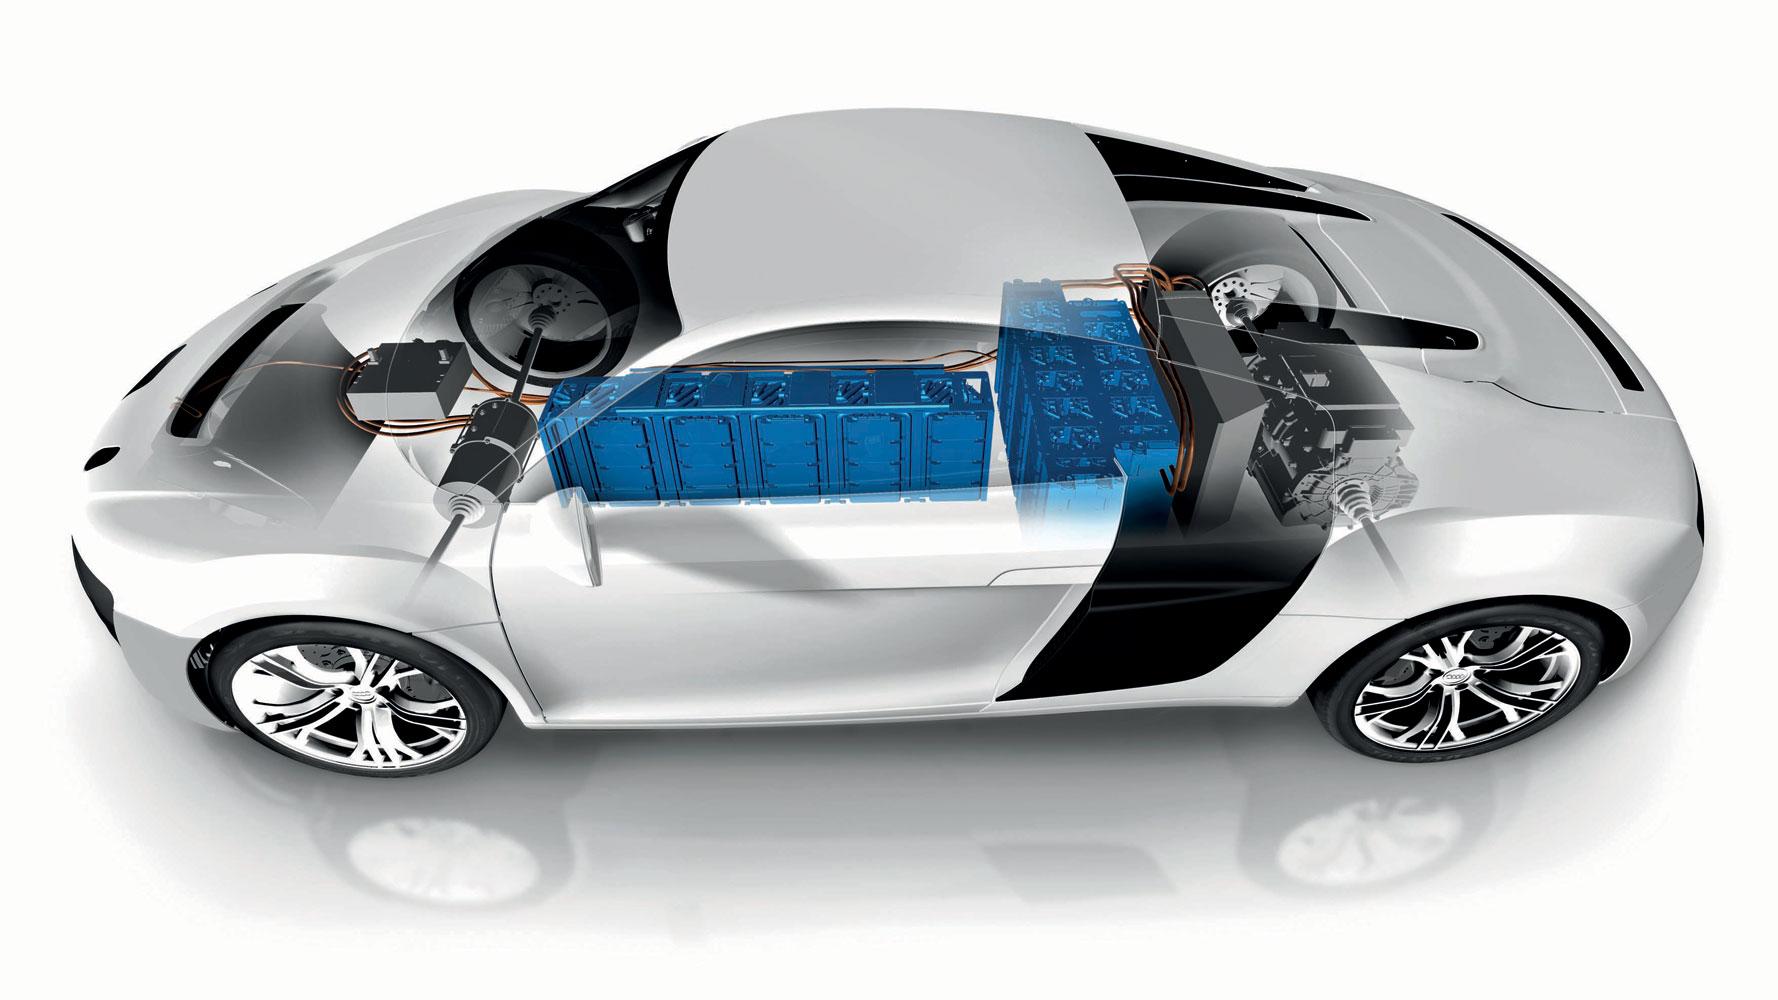 Audi F12 e performance, Audi R8 e-tron Zwilling [Video]